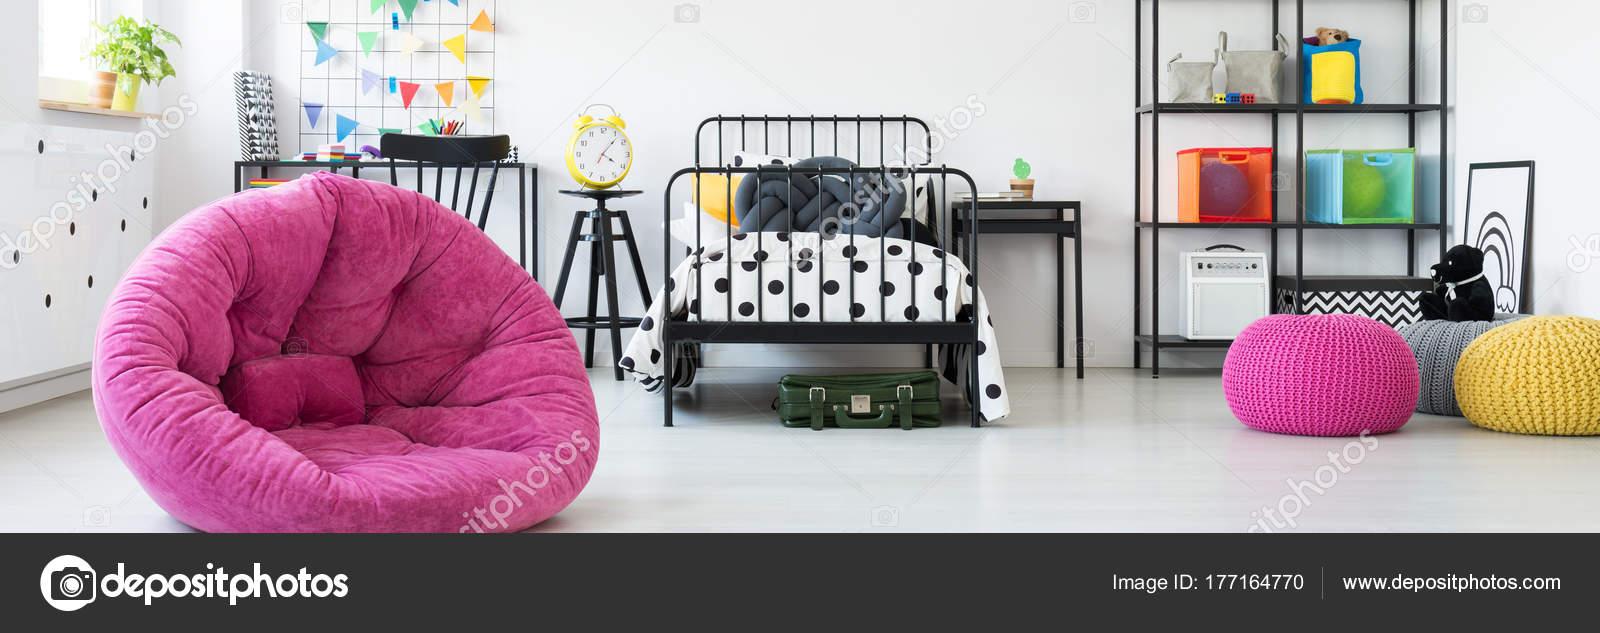 5a88e096ad9 Unisex παιδικό δωμάτιο με ζωηρόχρωμη διακόσμηση και μεταλλικά έπιπλα —  Εικόνα από ...